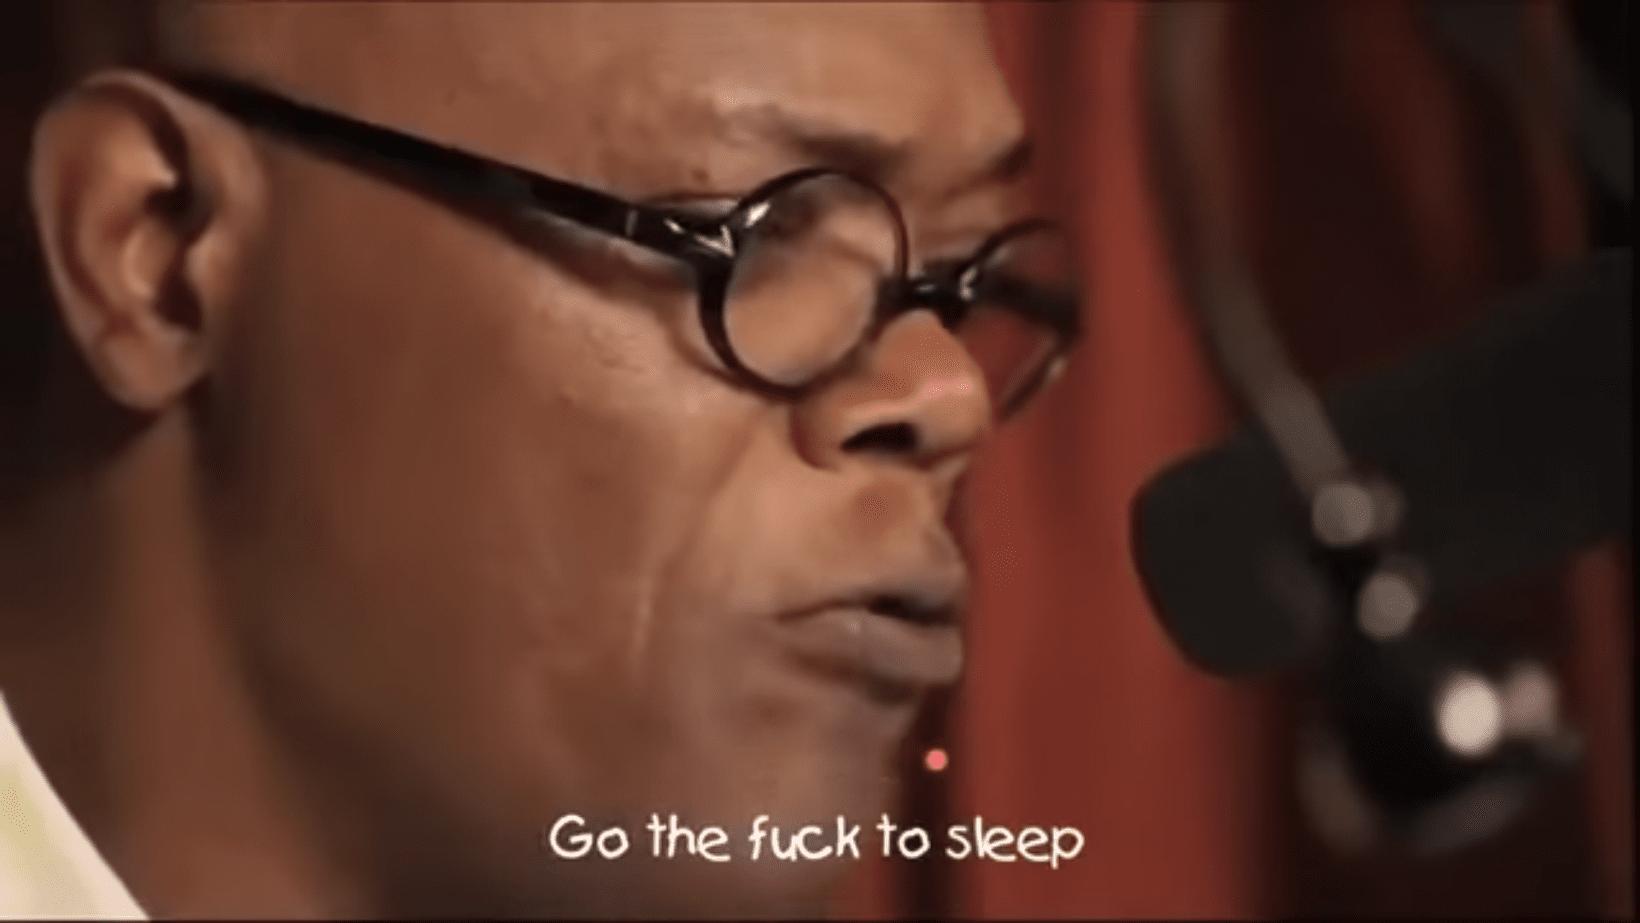 How to go the fuck to sleep